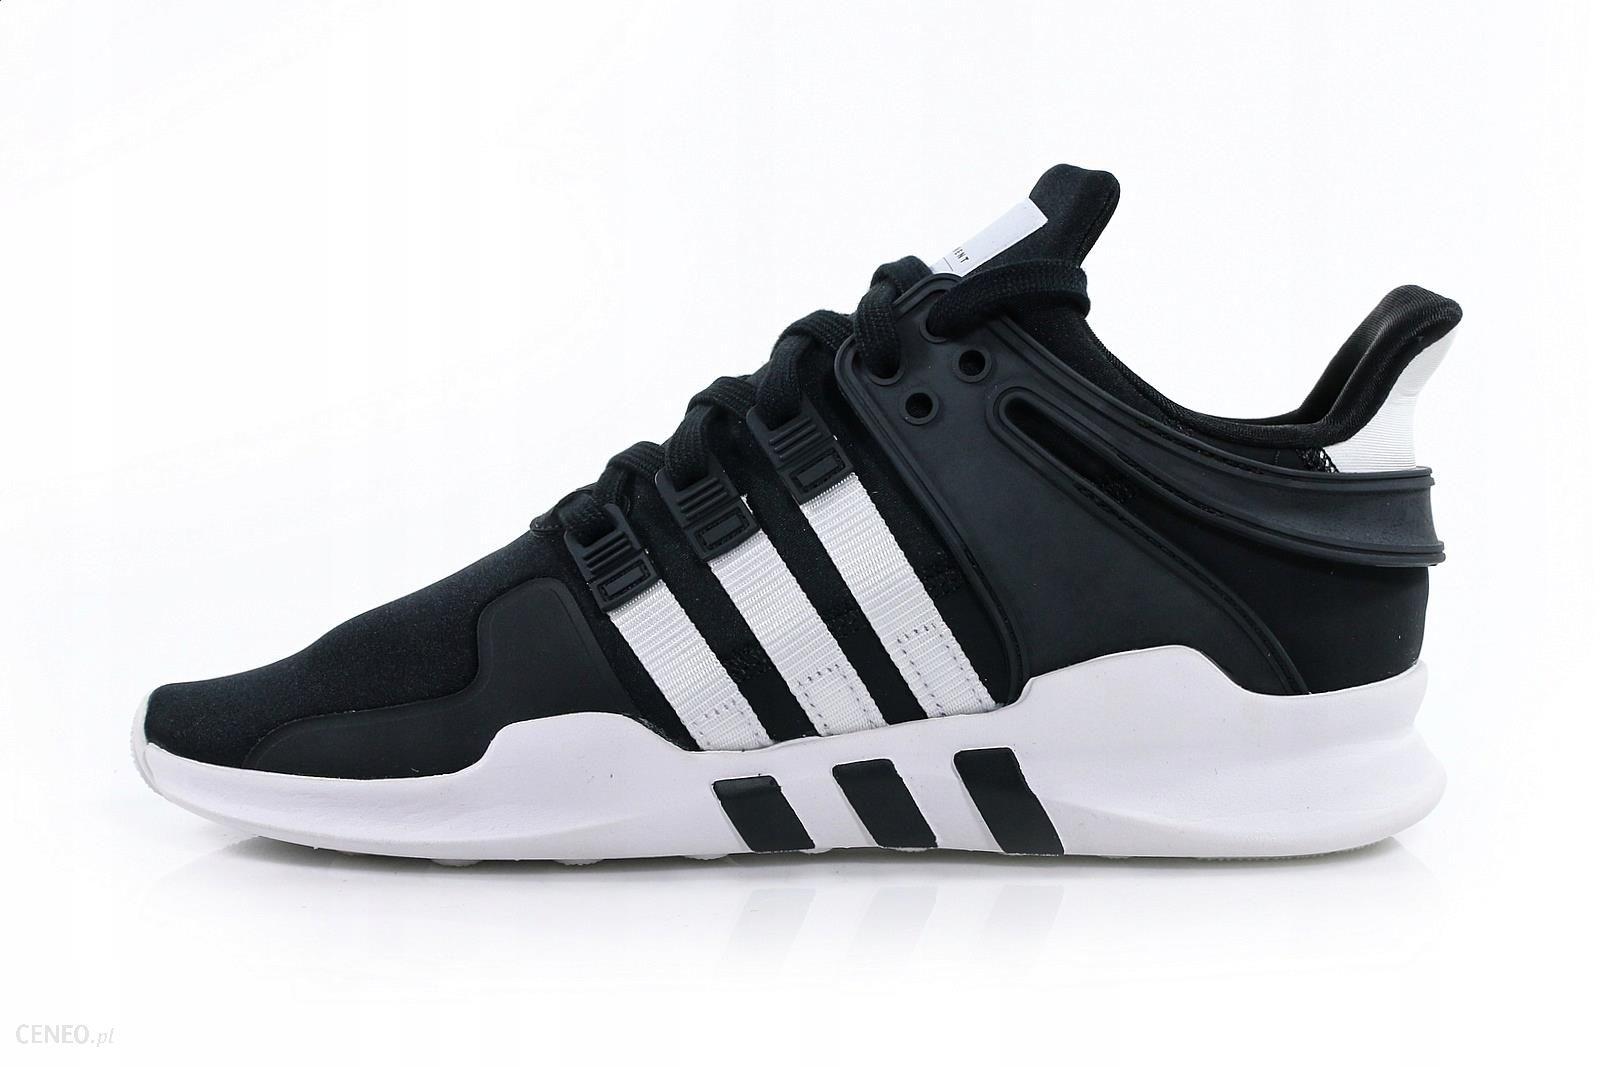 separation shoes 0d1d5 67419 Allegro. Buty męskie adidas EQT SUPPORT ADV B37351 - zdjęcie 1